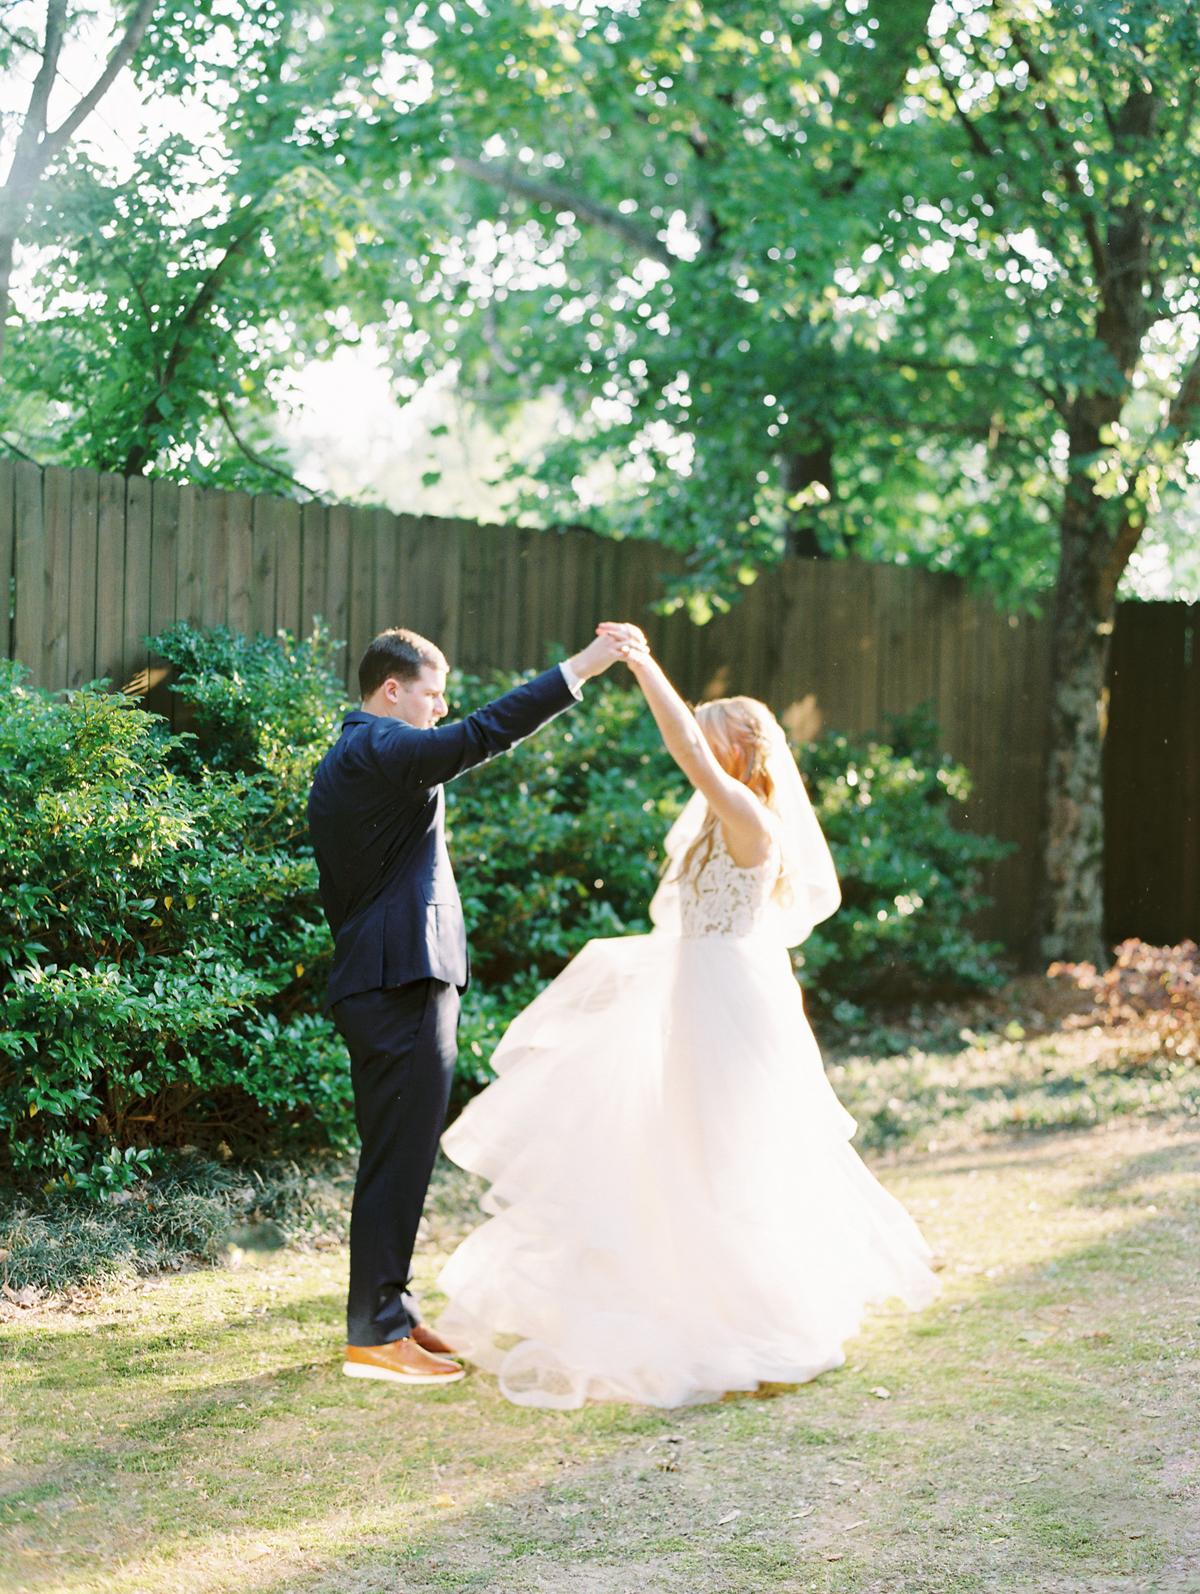 Foundry-At-Puritan-Mill-wedding-photos-venue-atlanta-fine-art-film-photographer47.JPG